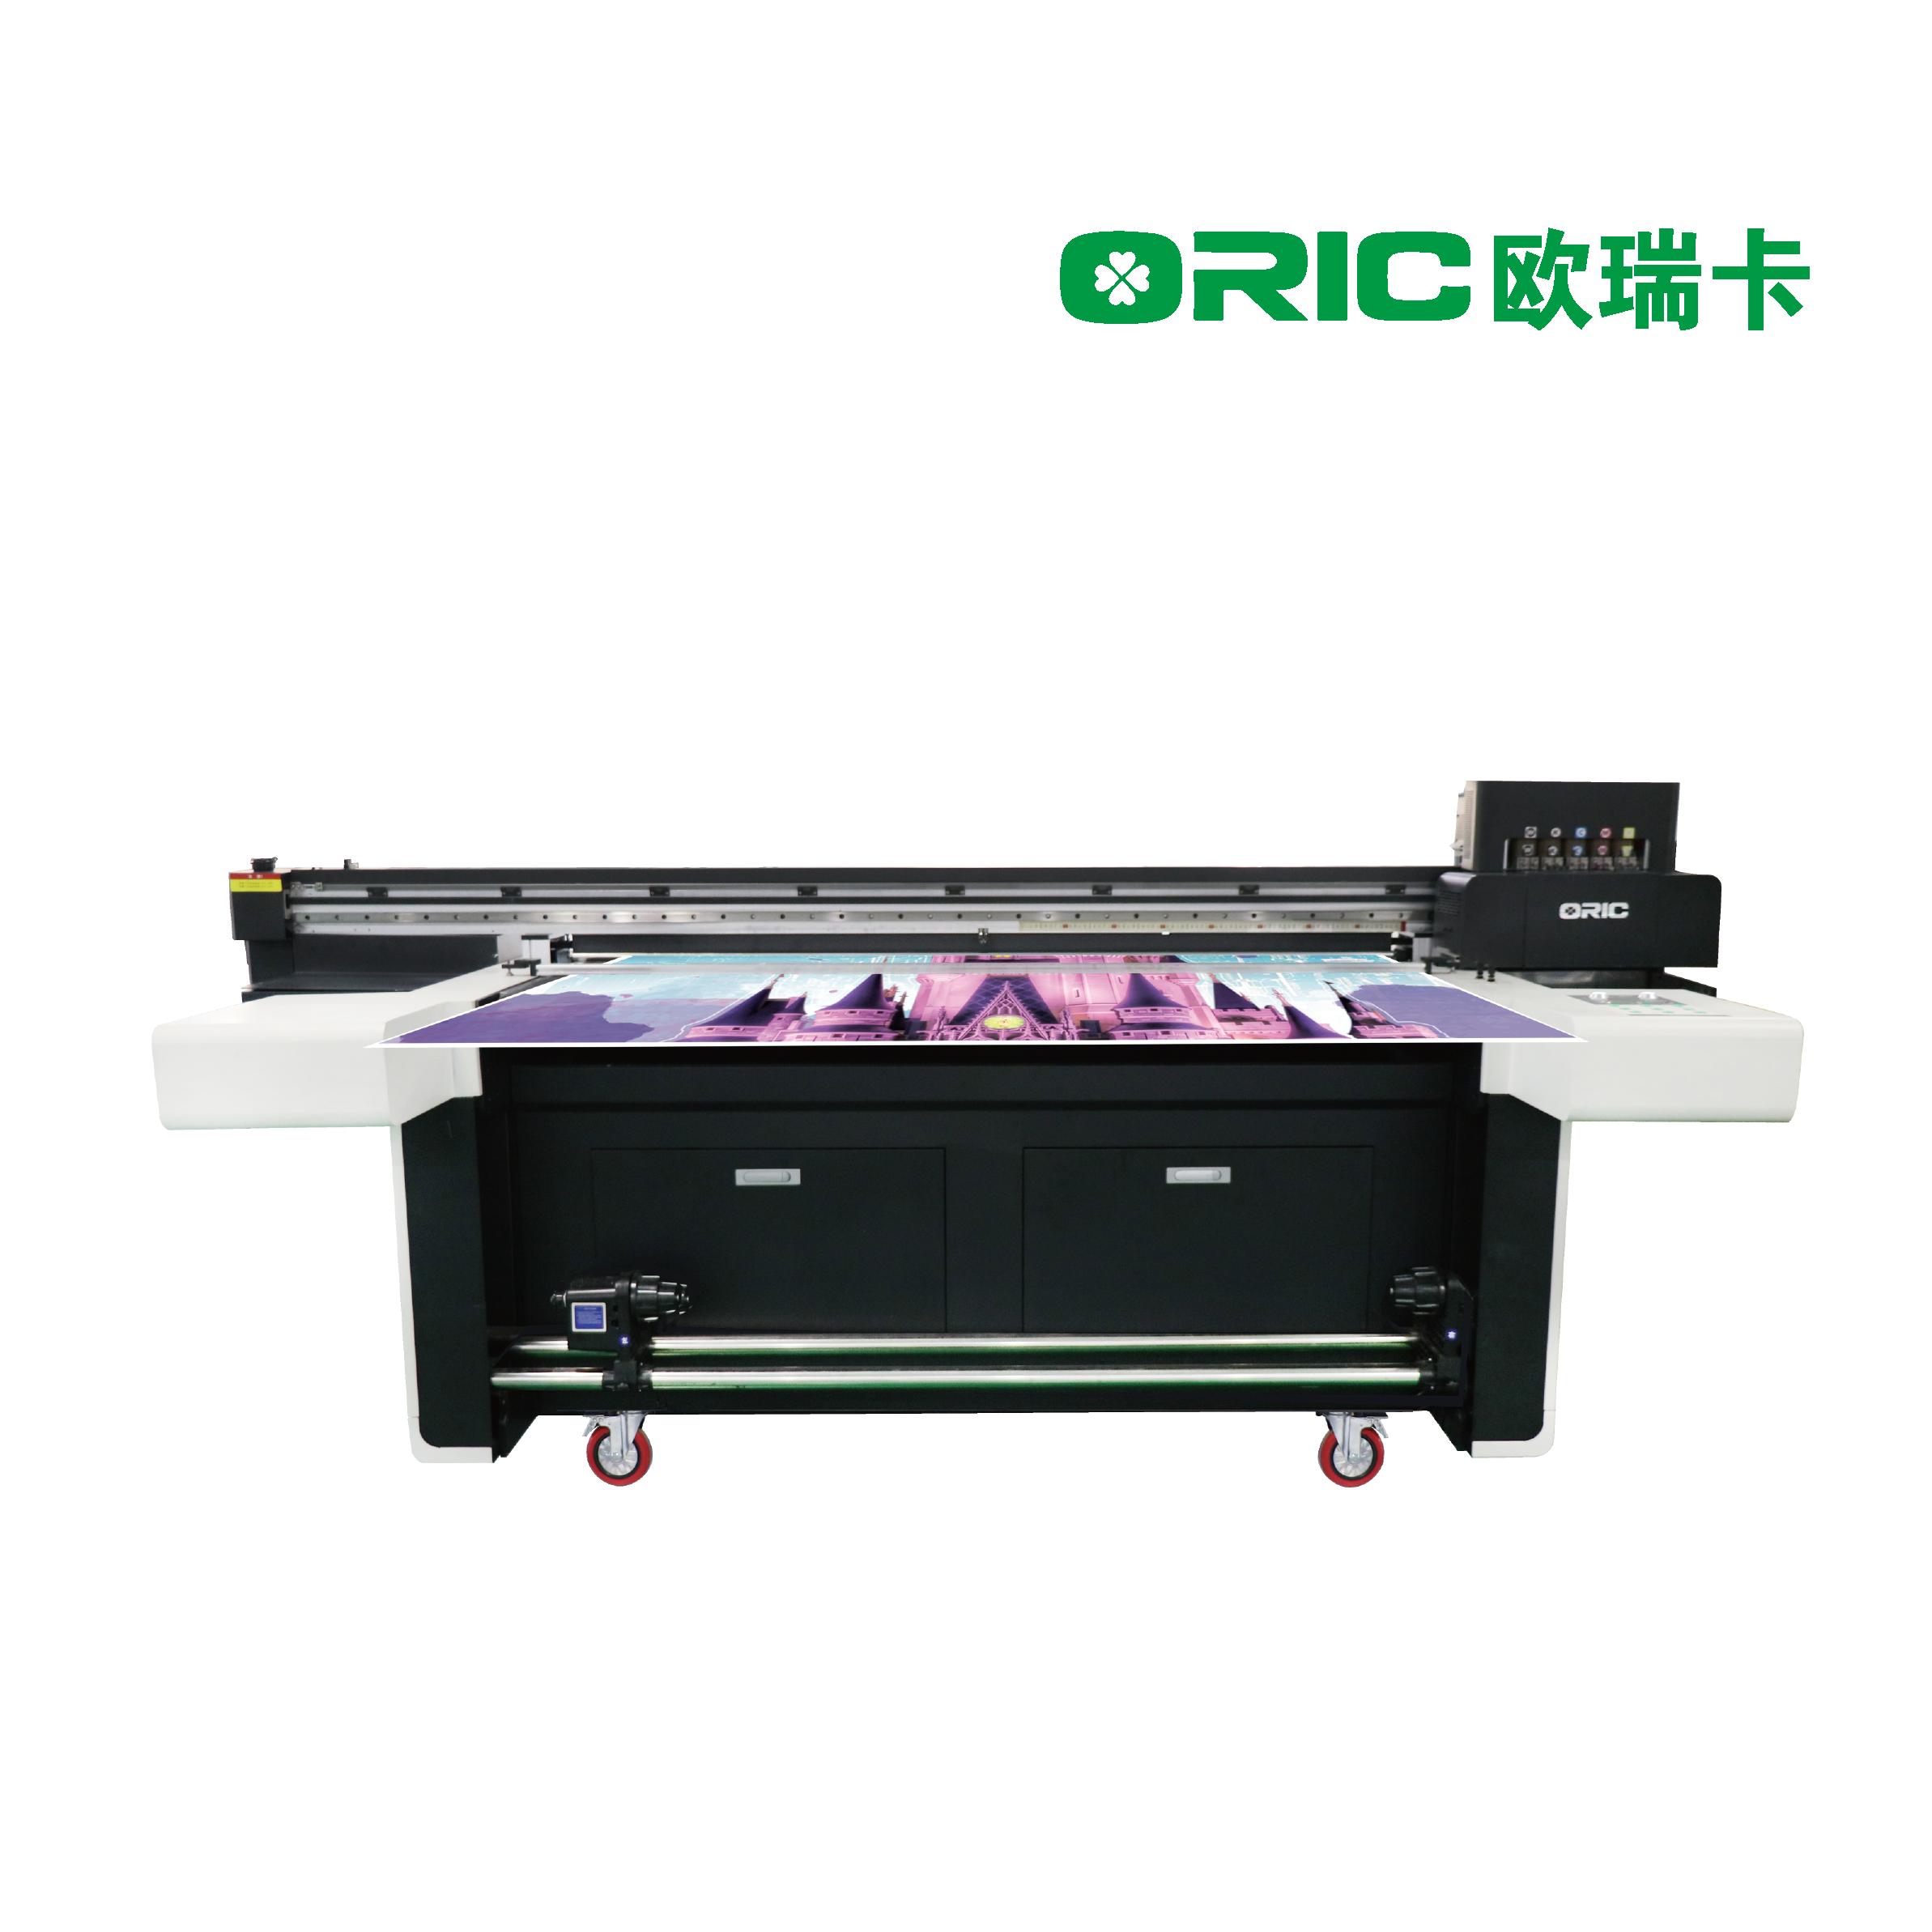 ORIC -机器图片 -new-03